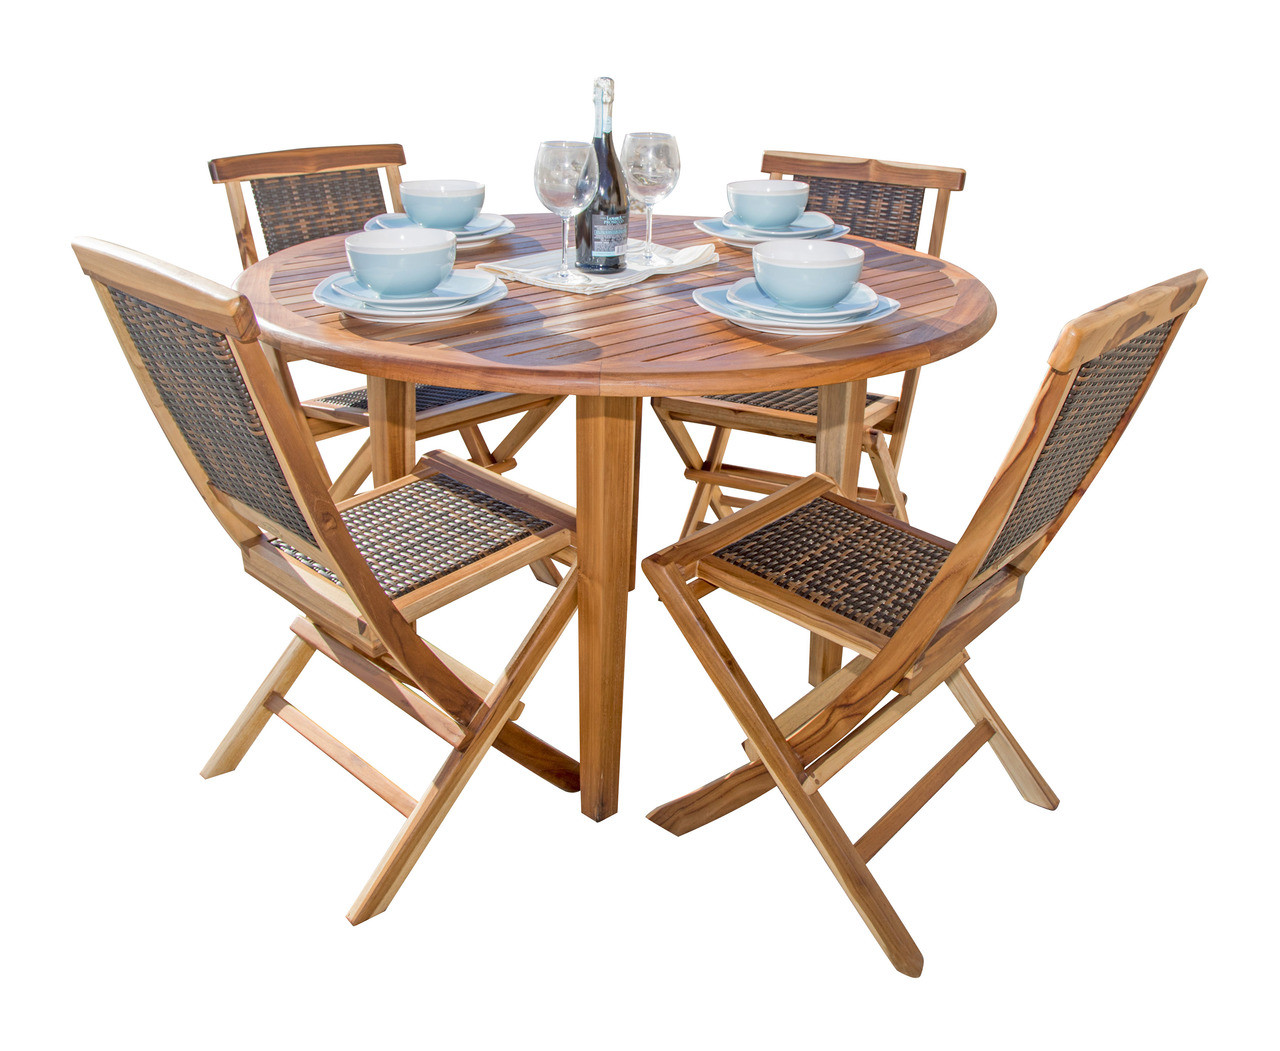 "EcoDecors Oasis 48"" Teak Wood Round Table in EarthyTeak Finish"